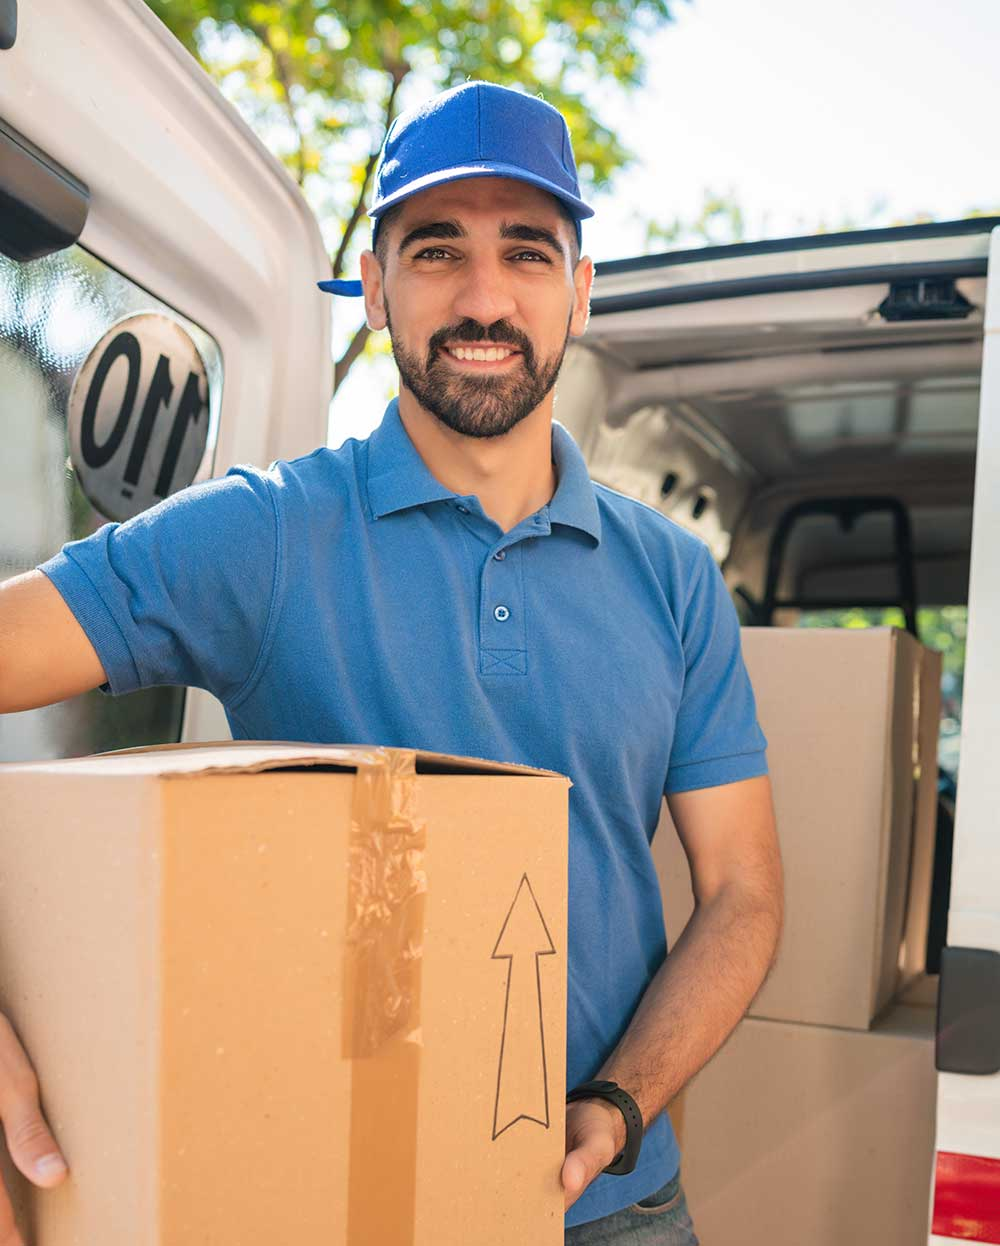 PrimeWay Commercial Vehicle Loan Features